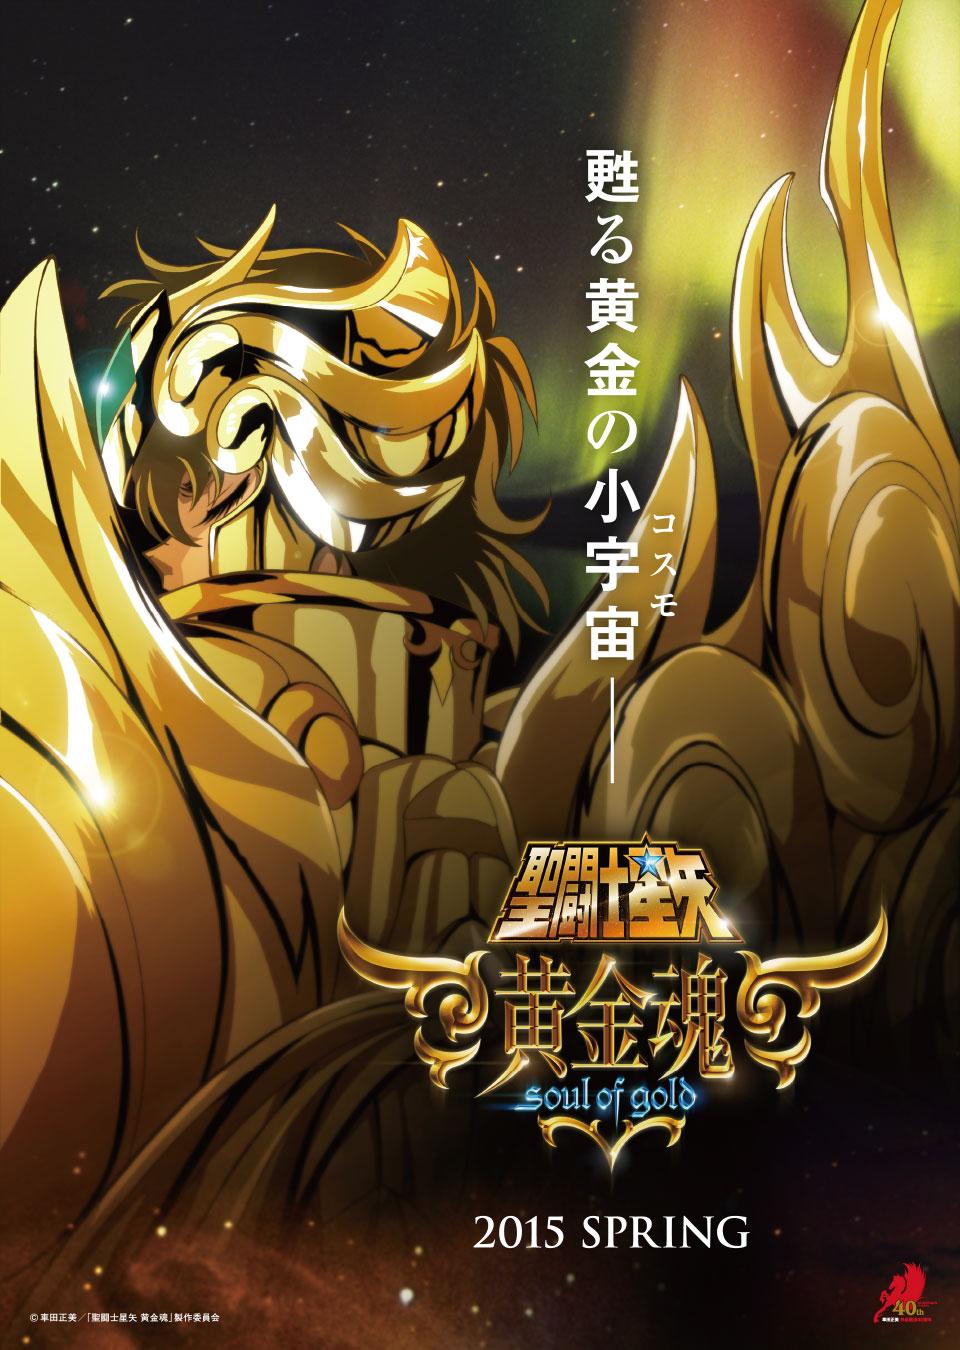 Soul of Gold Nuevo anime de Saint Seiya + muñecos nuevos VwhiXHqC